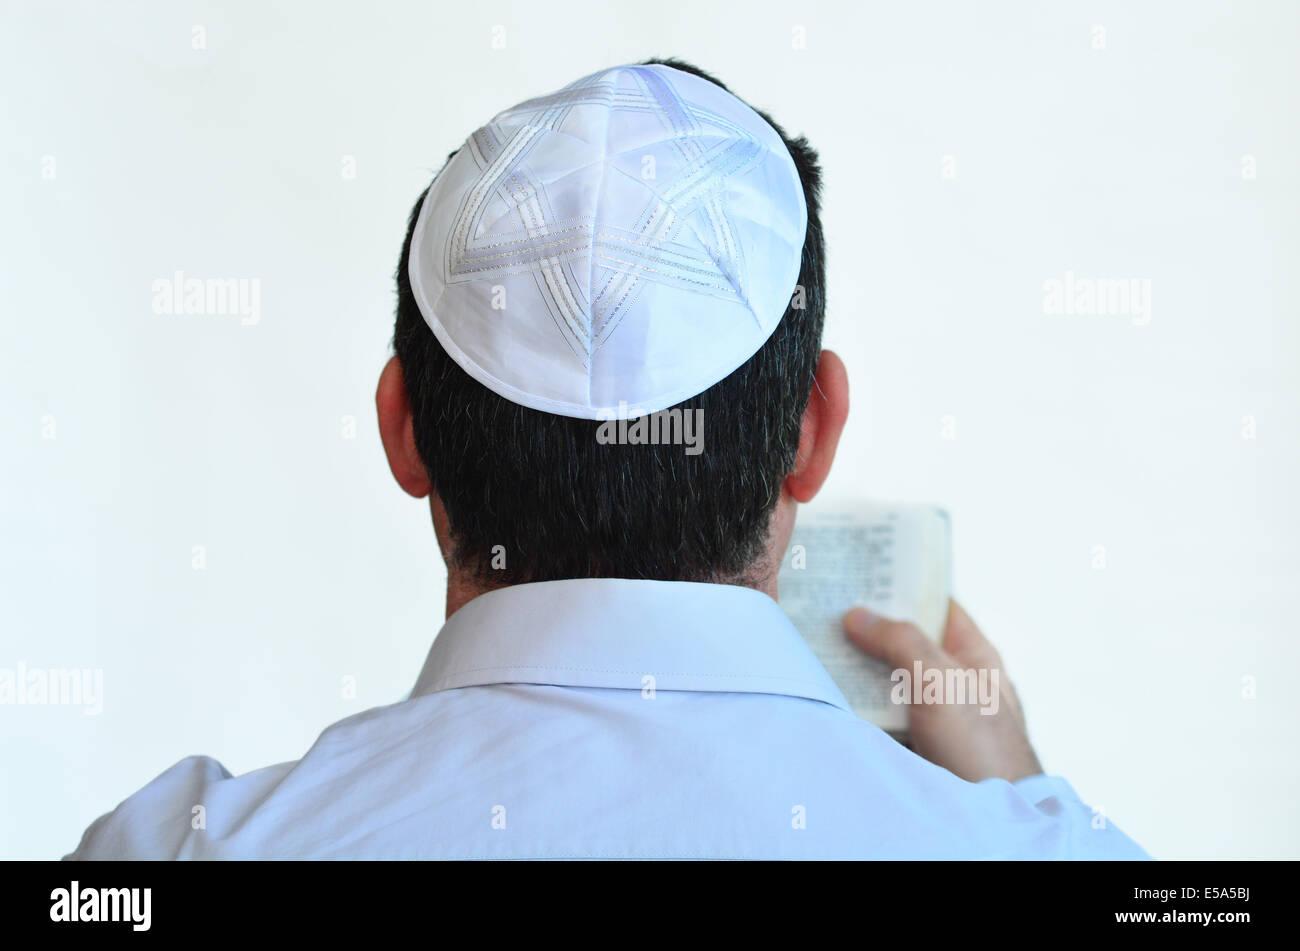 Jewish man with kippah pray isolated on white background. Concept photo Judaism ,religion belief, faith, lifestyle - Stock Image